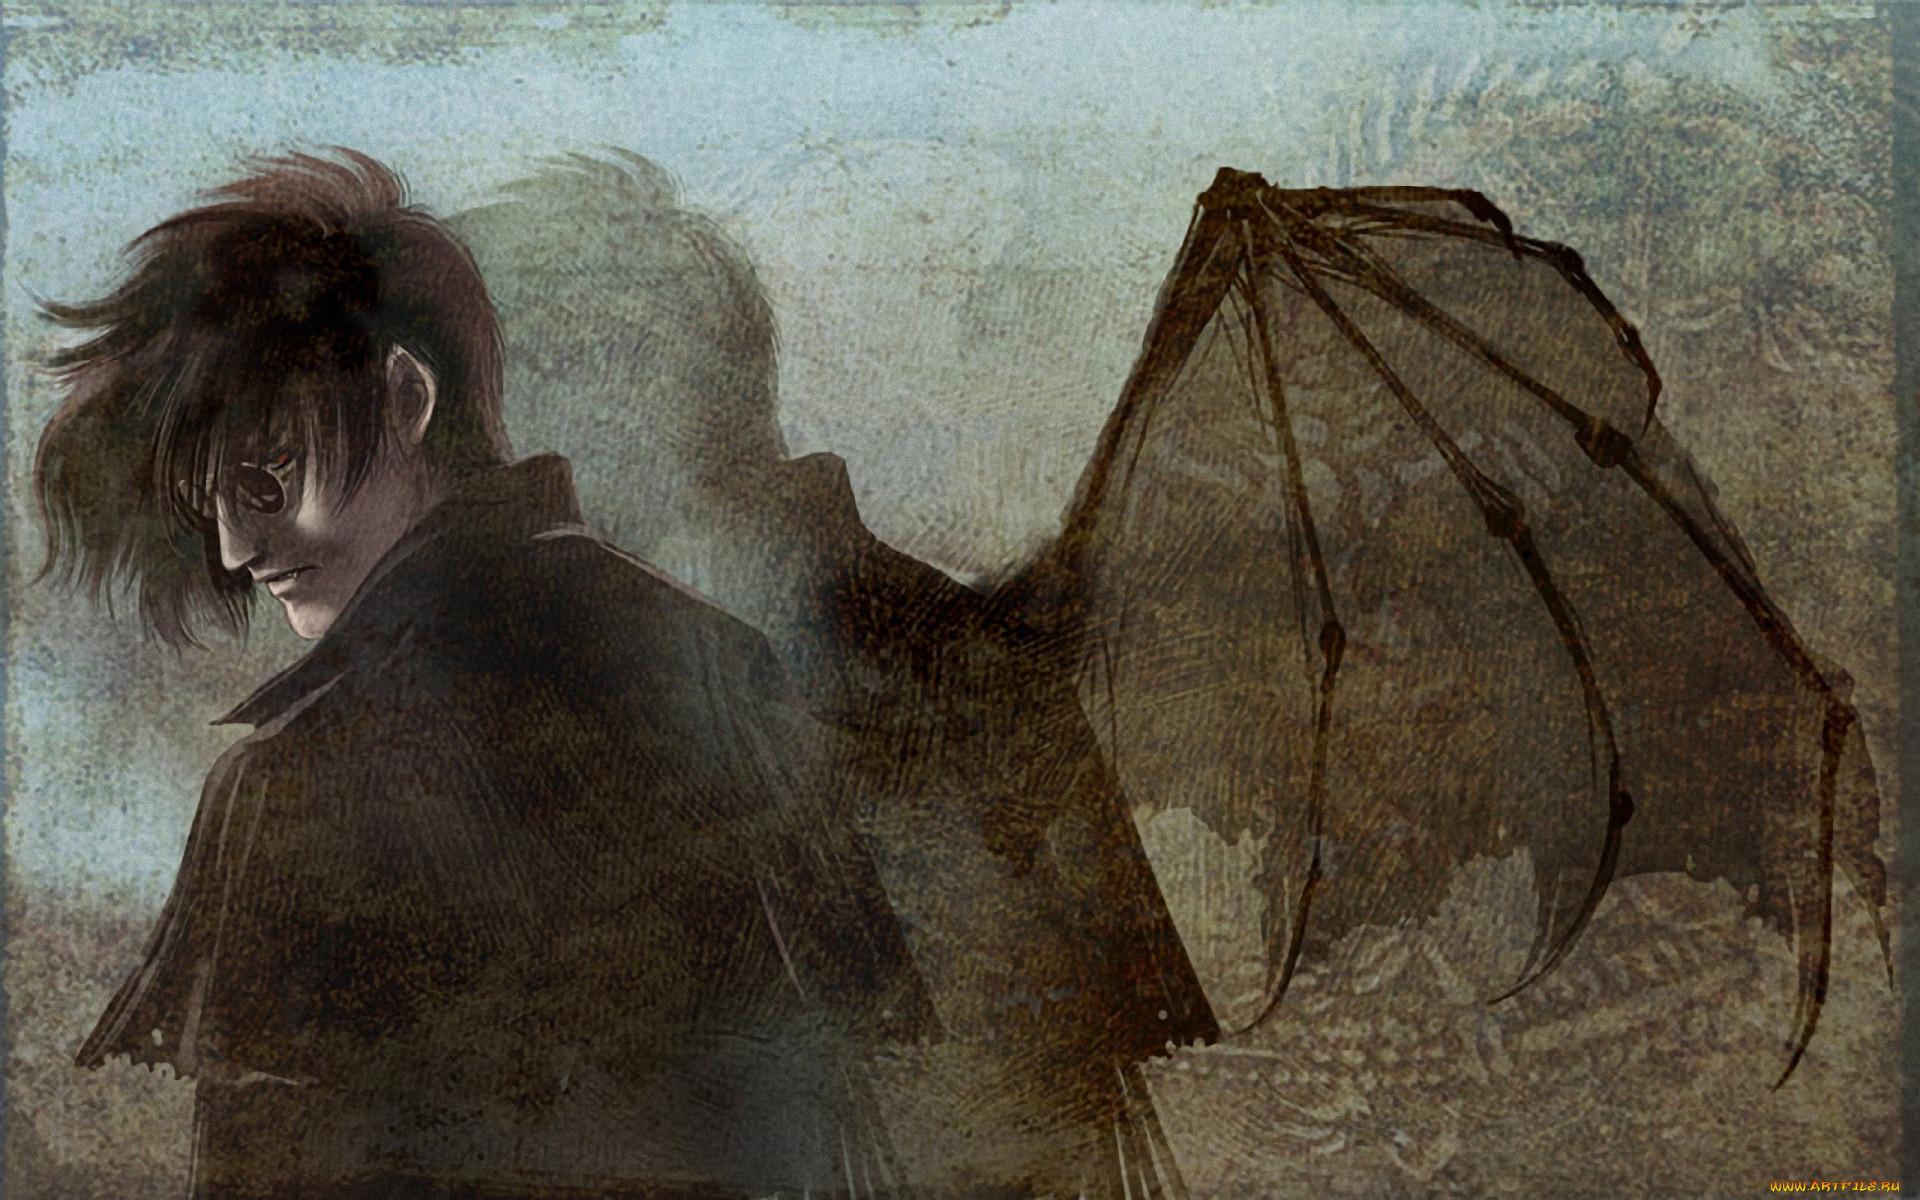 аниме, hellsing, алукард, alucard, дракула, вампир, dracula, крылья